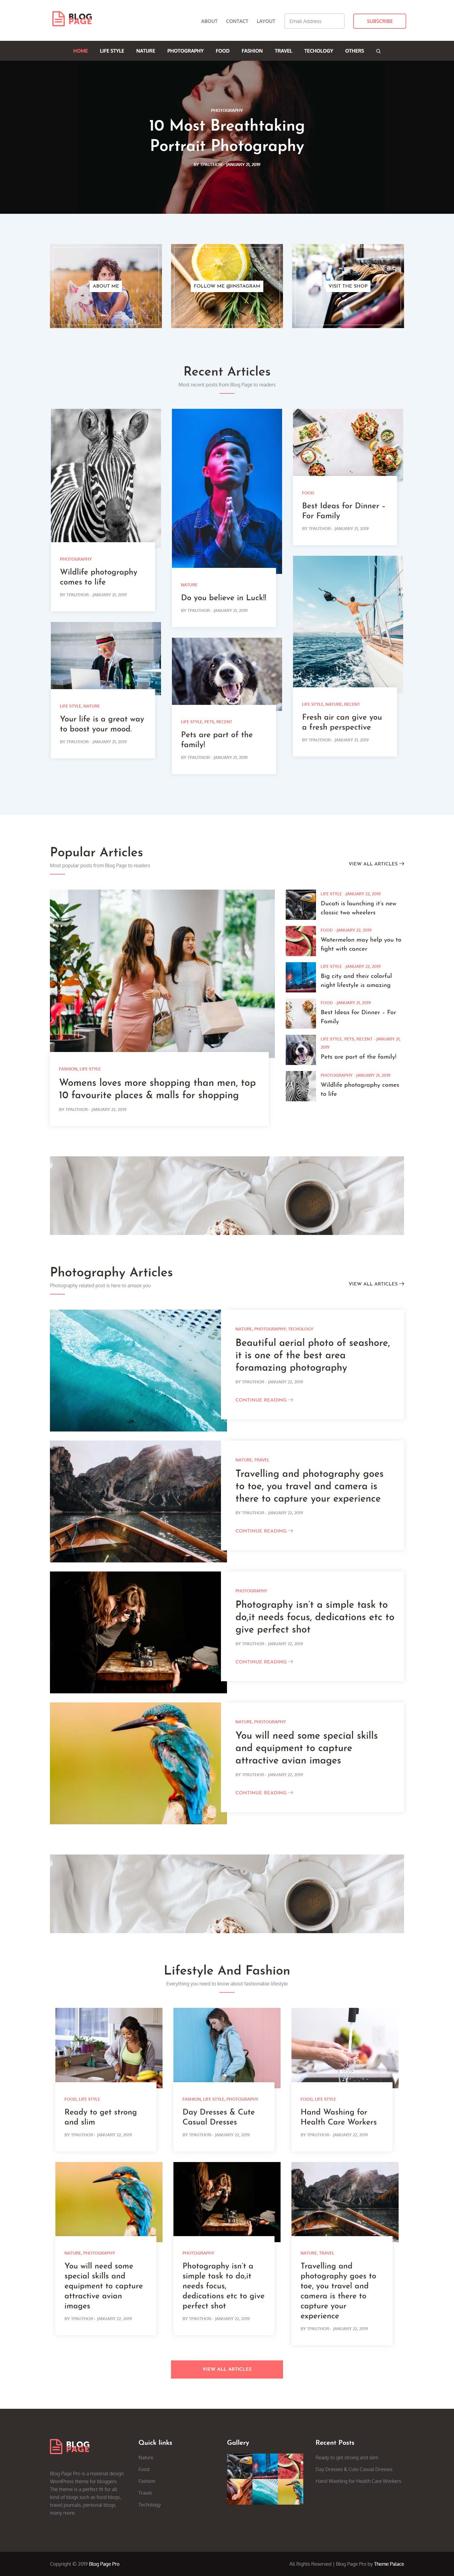 Blog Page Pro